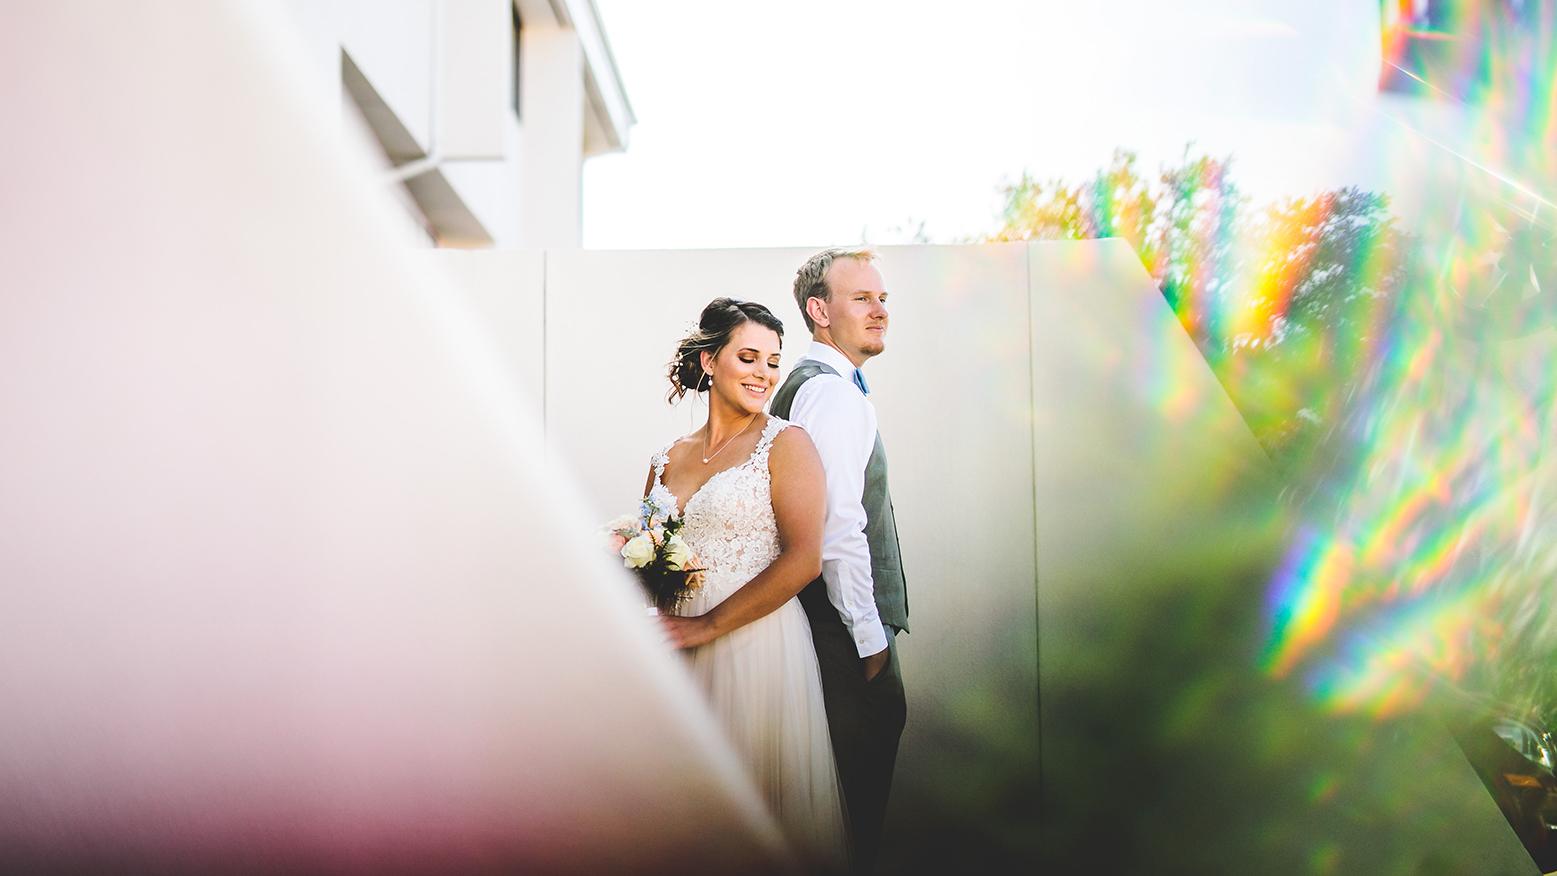 prisming on the wedding day.jpg